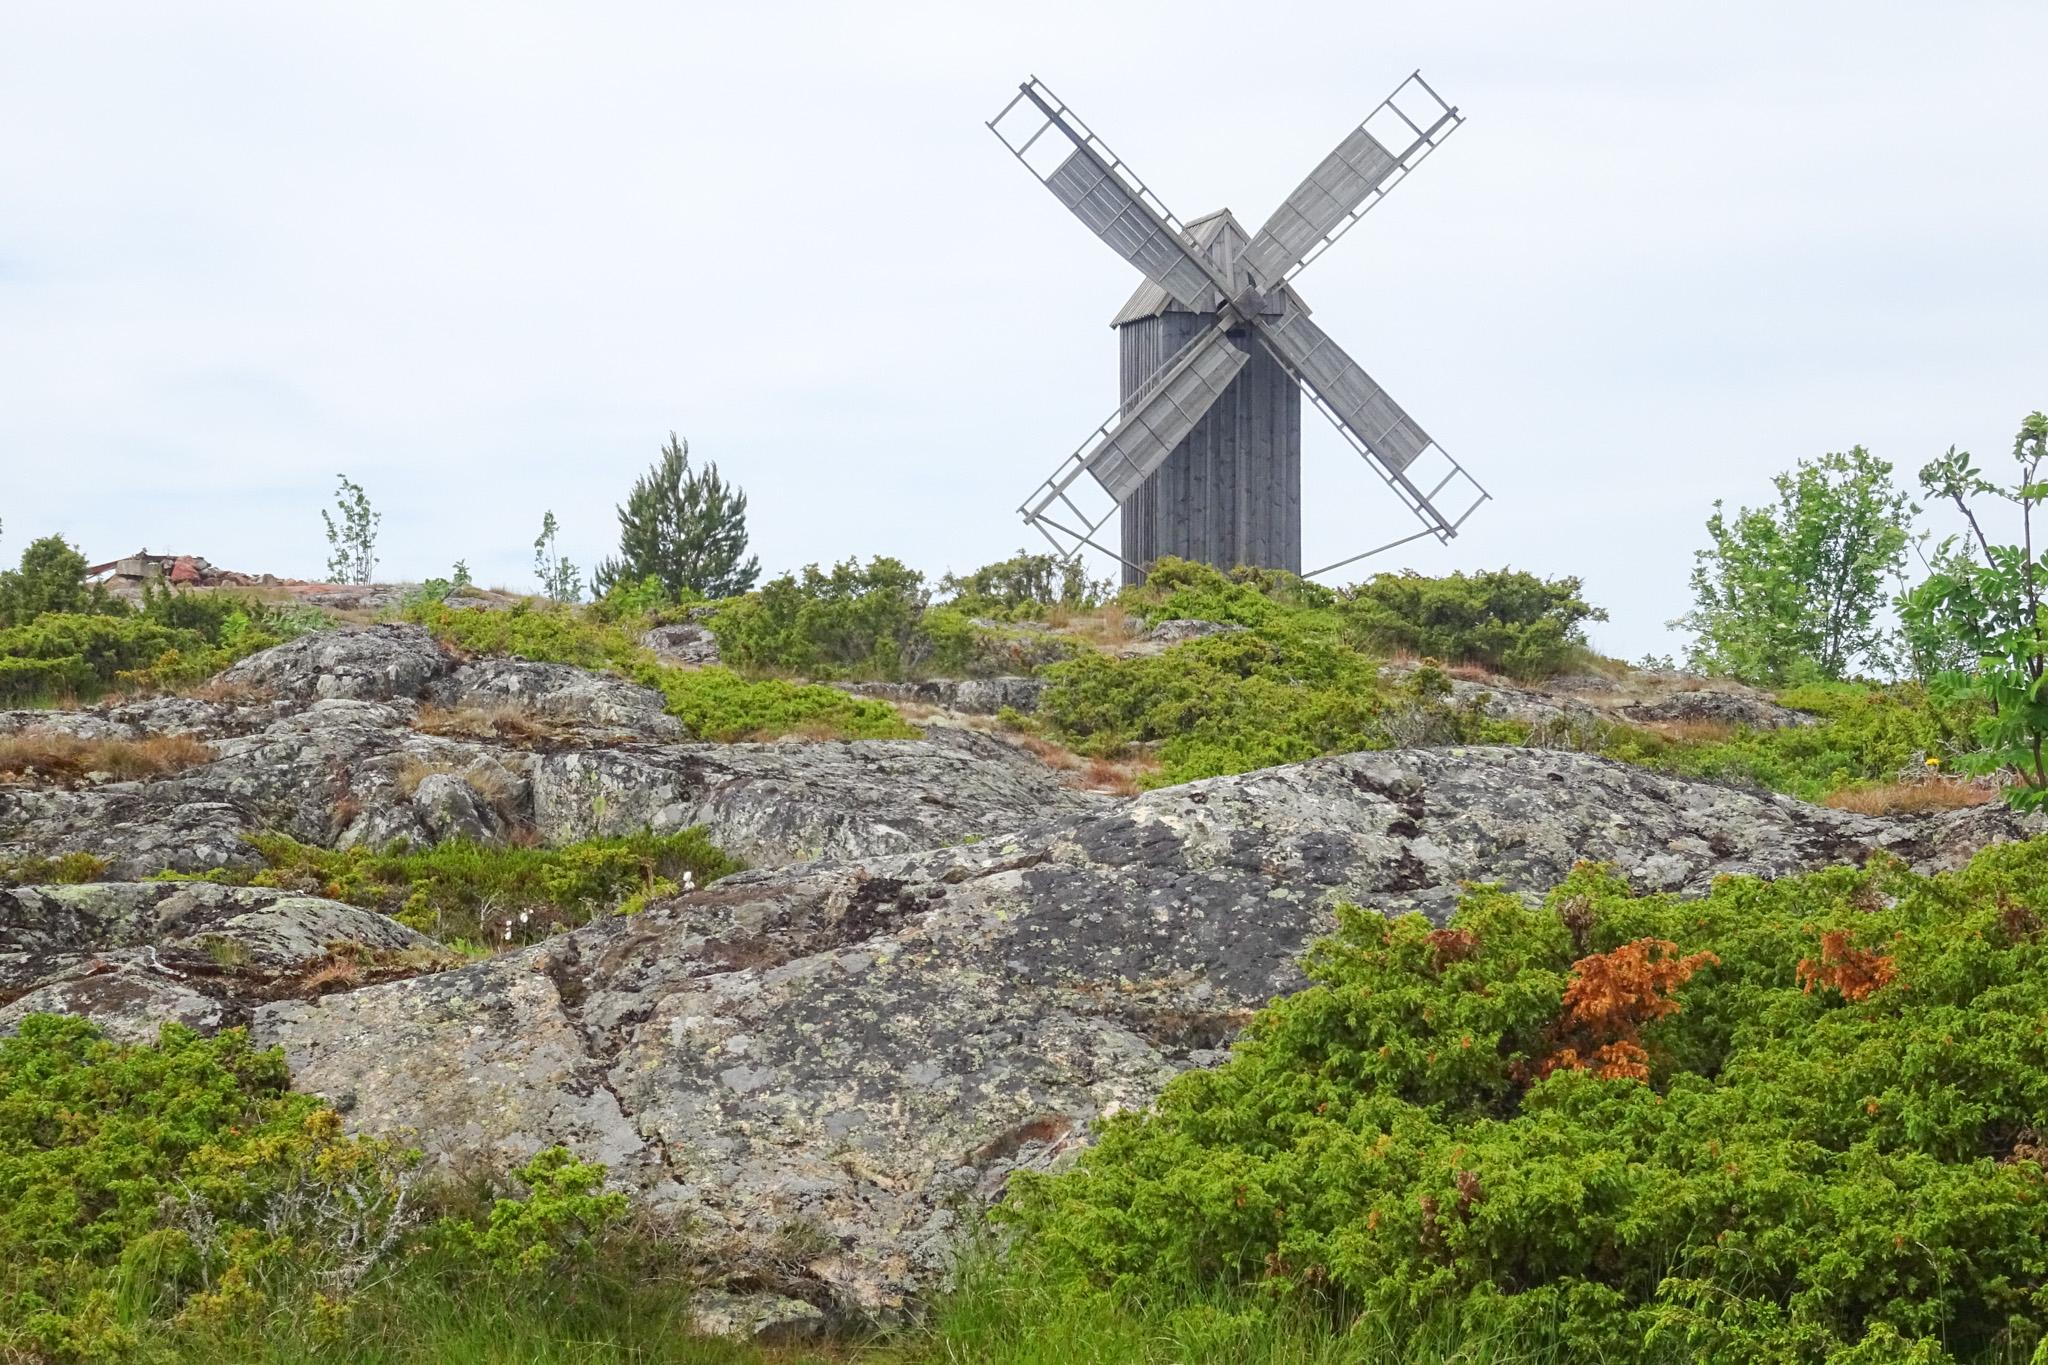 Mühle oberhalb der Alten Schmiede